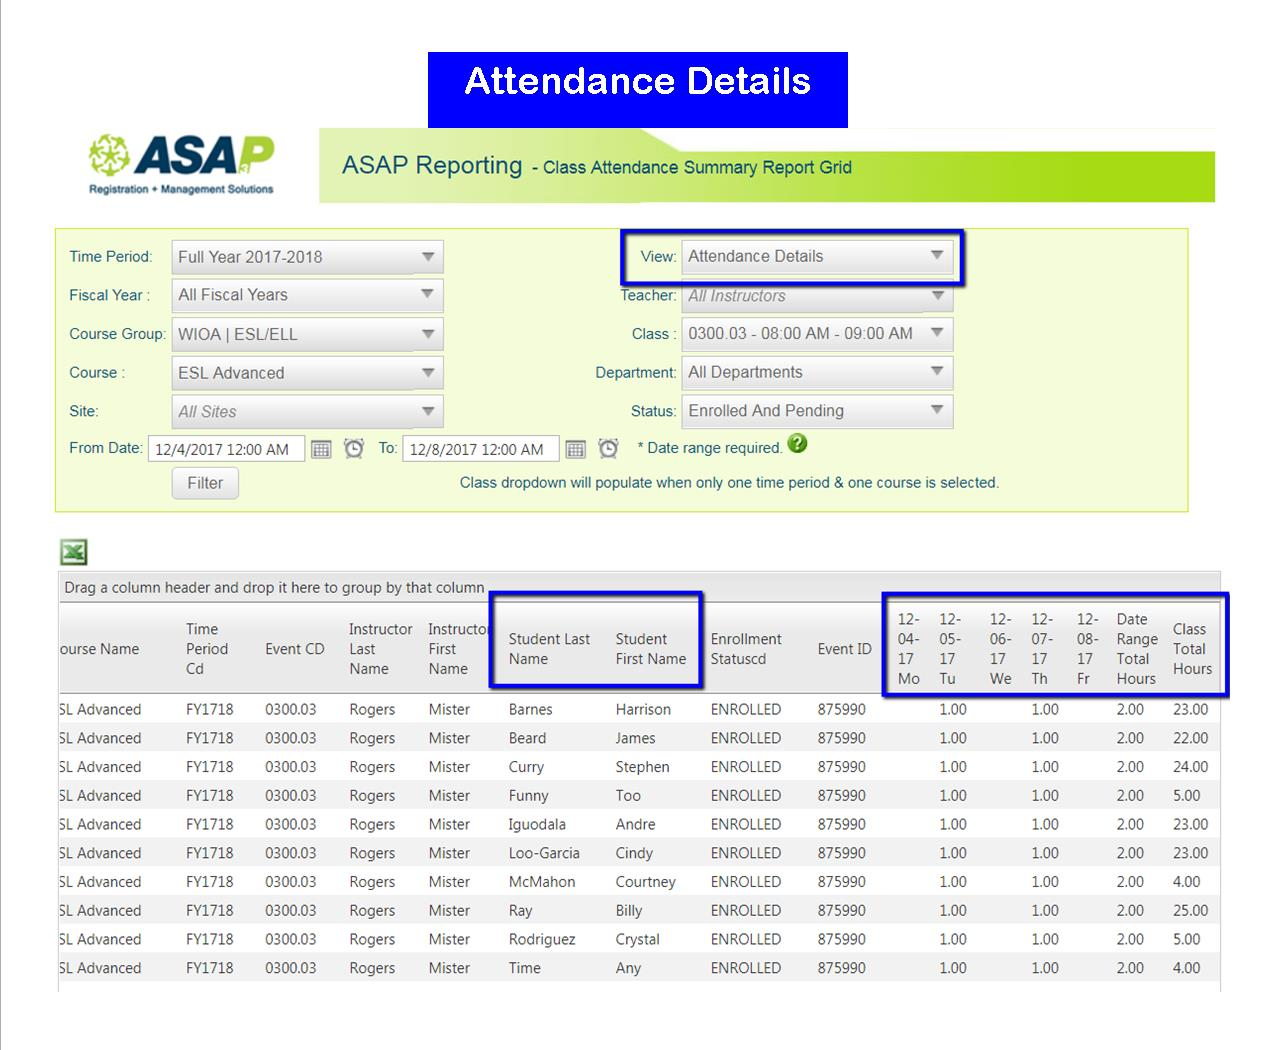 Attendance_Details.jpg